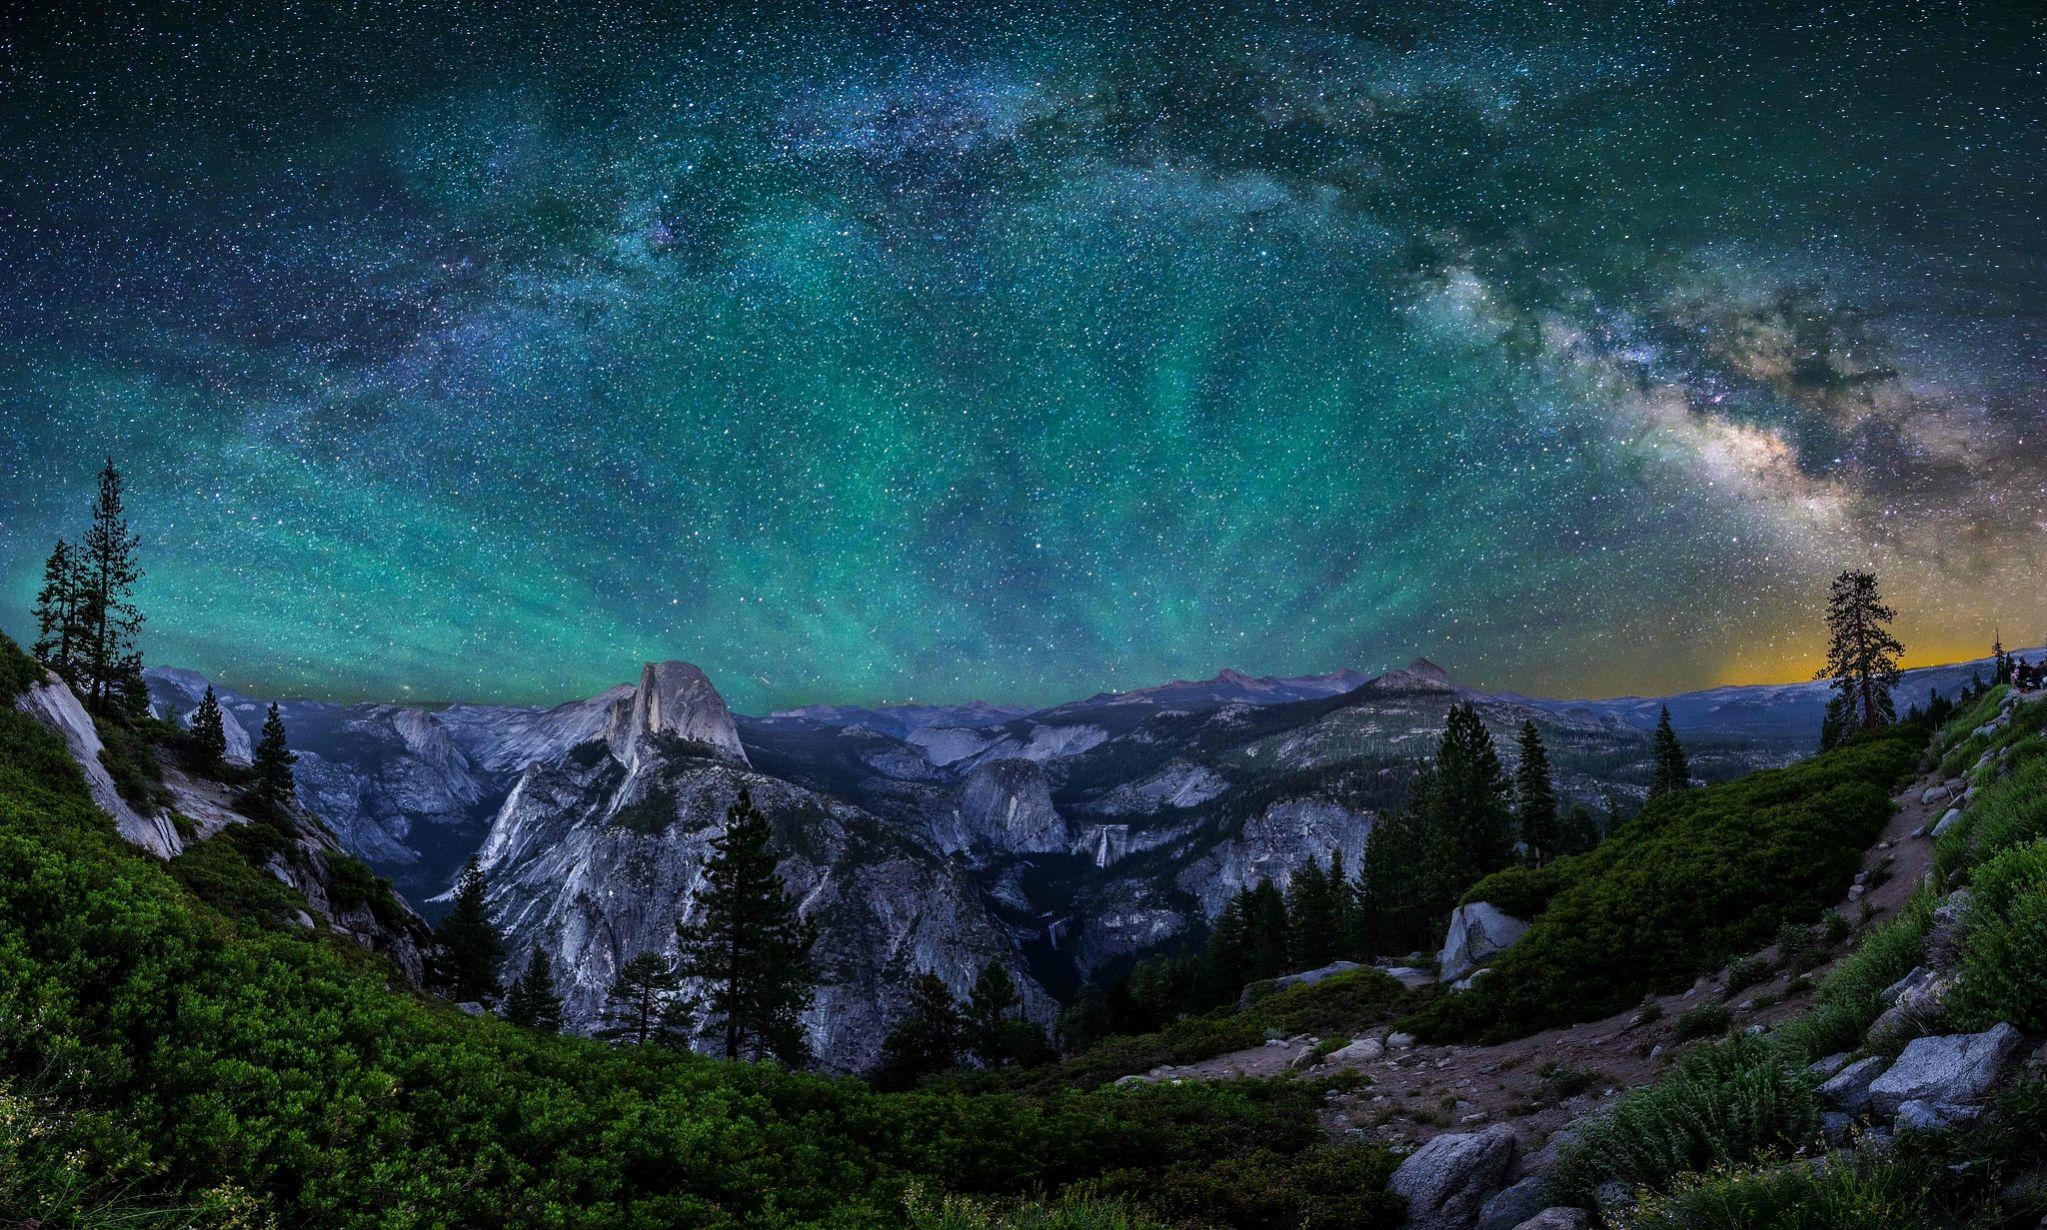 earth yosemite national park wallpaper